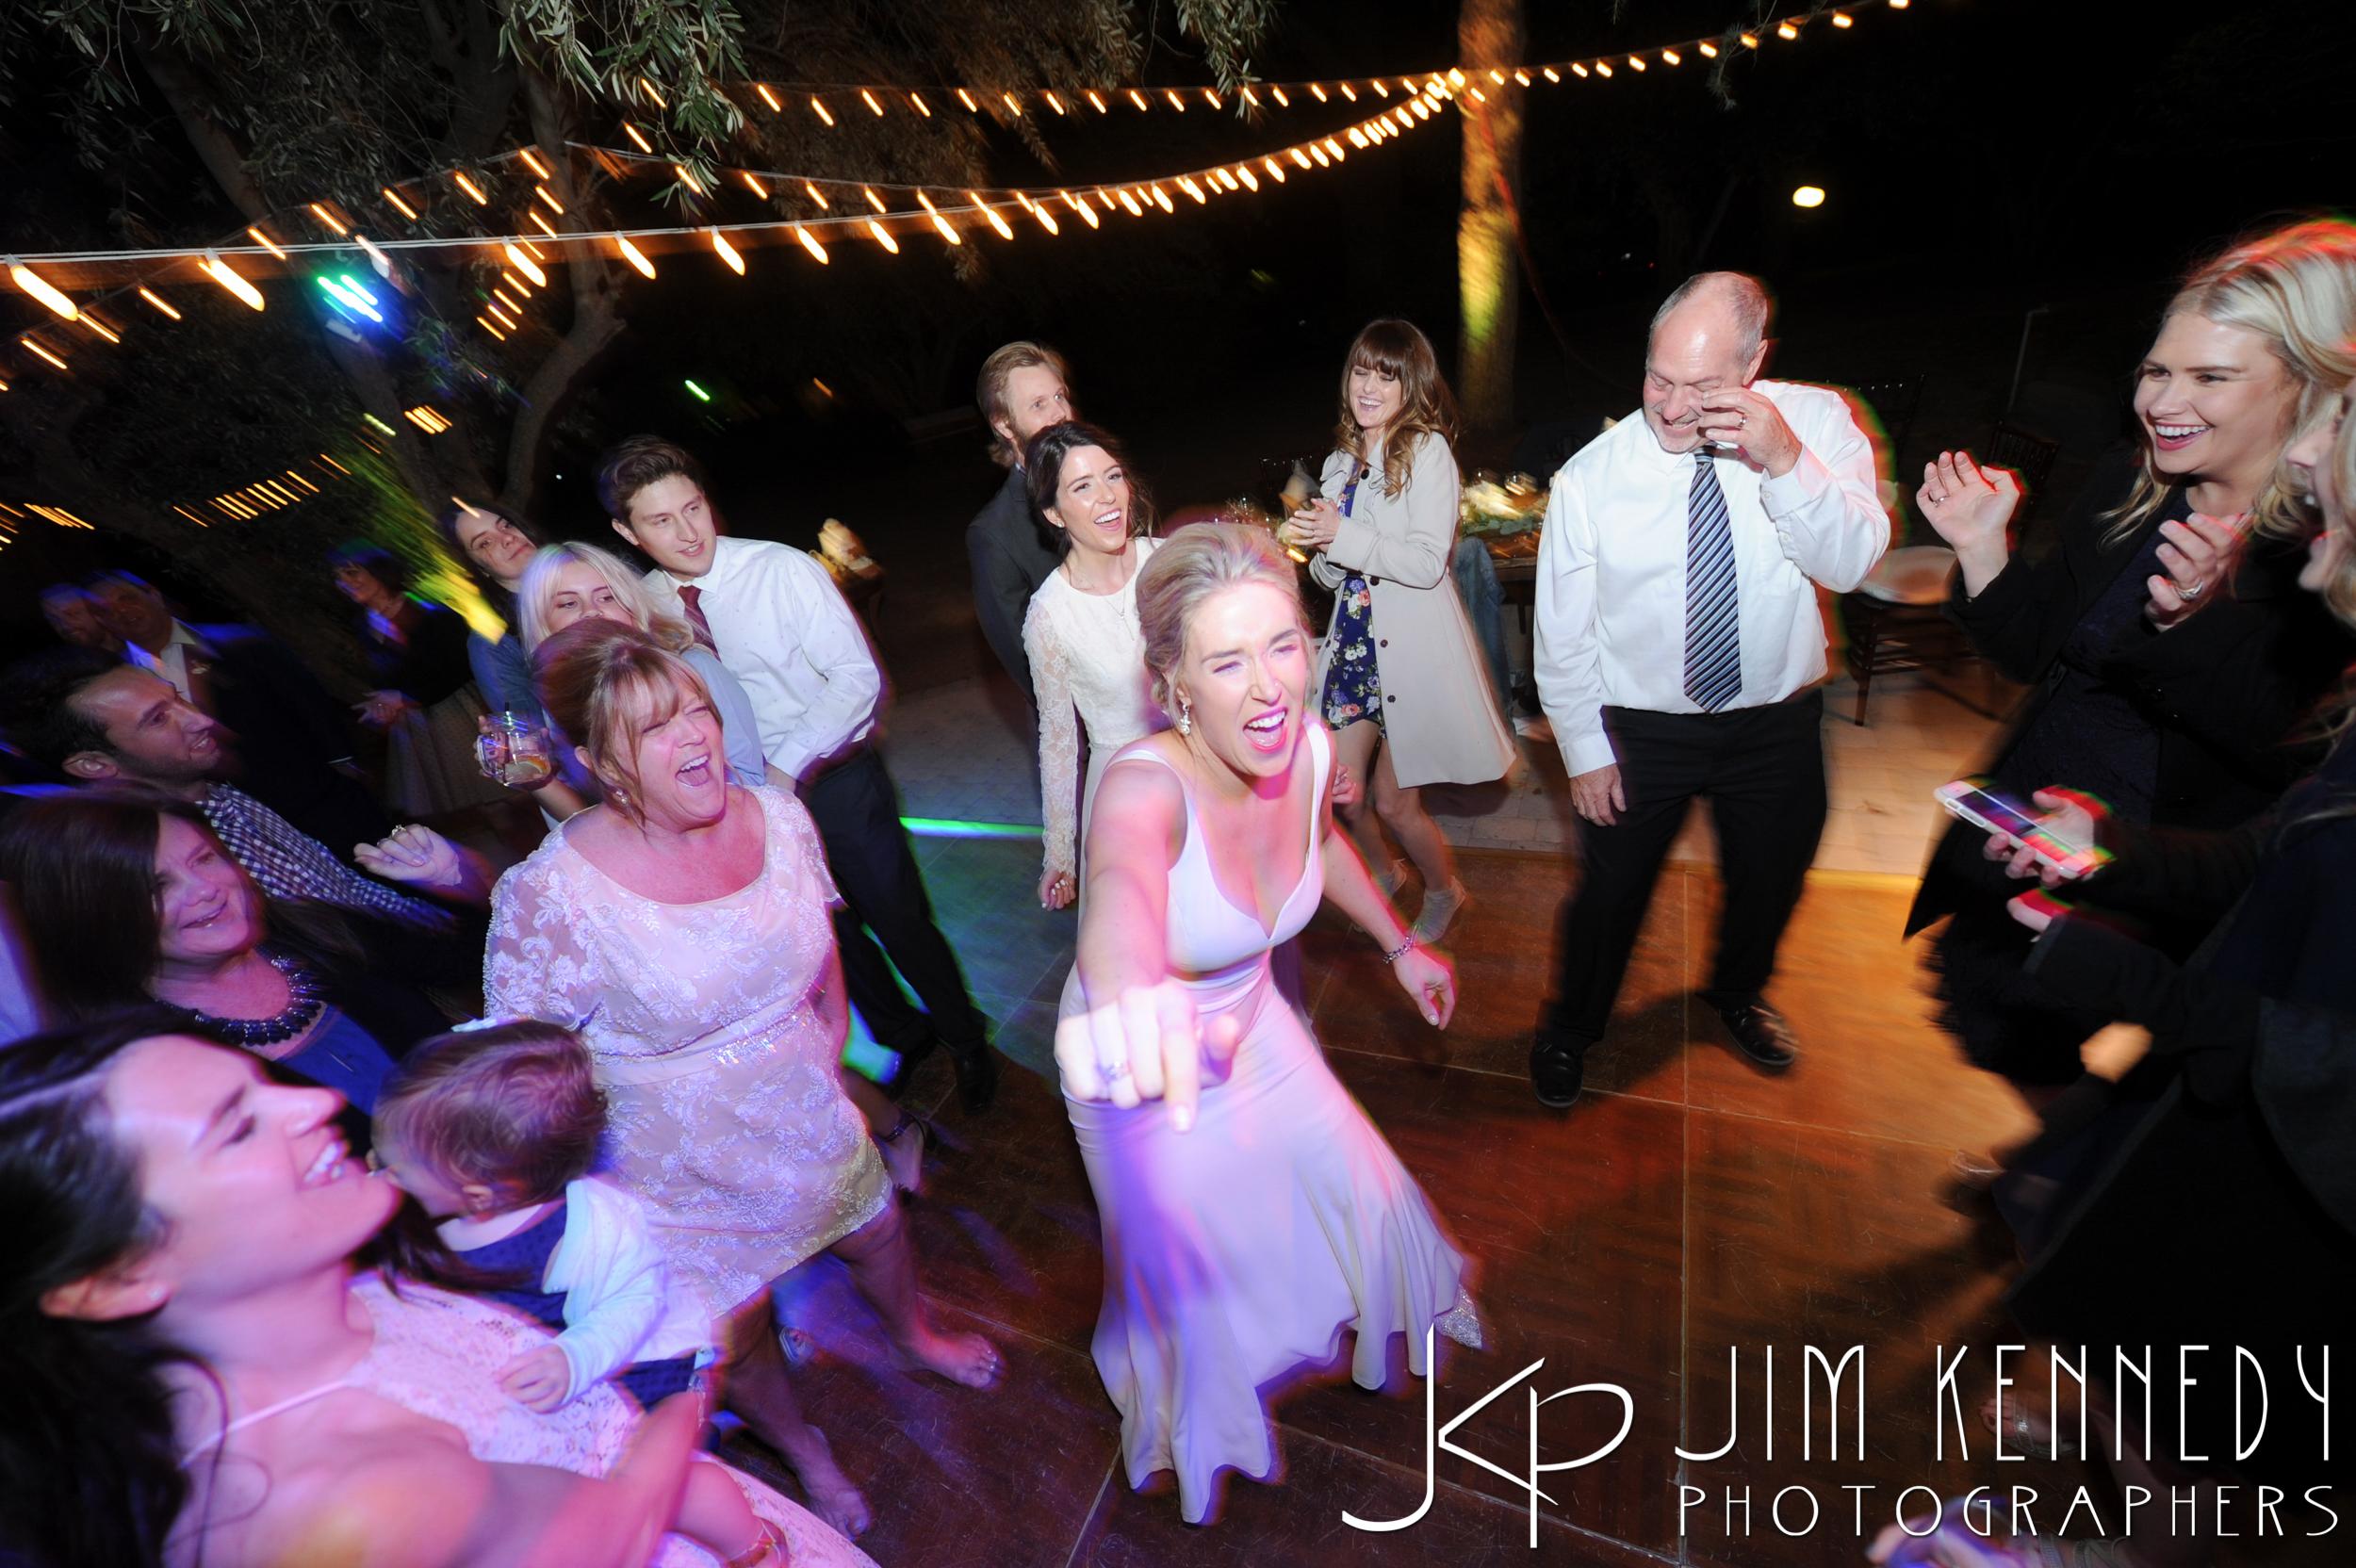 jim_kennedy_photographers_highland_springs_wedding_caitlyn_0211.jpg